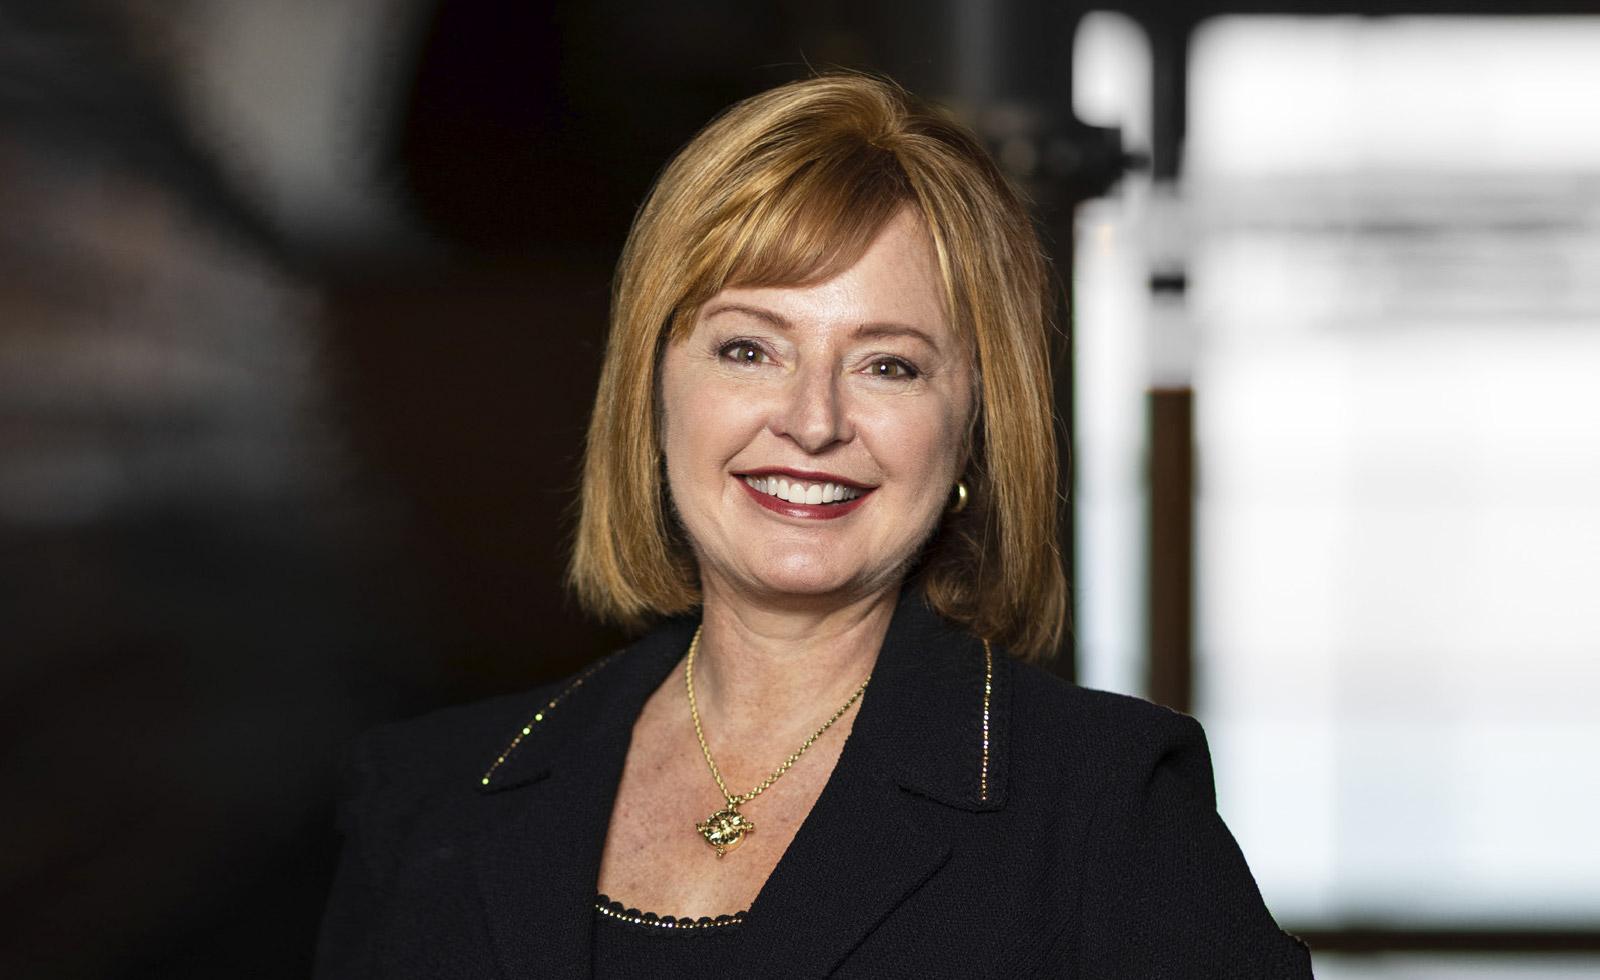 Linda Maclachlan, CEO and founder of entara